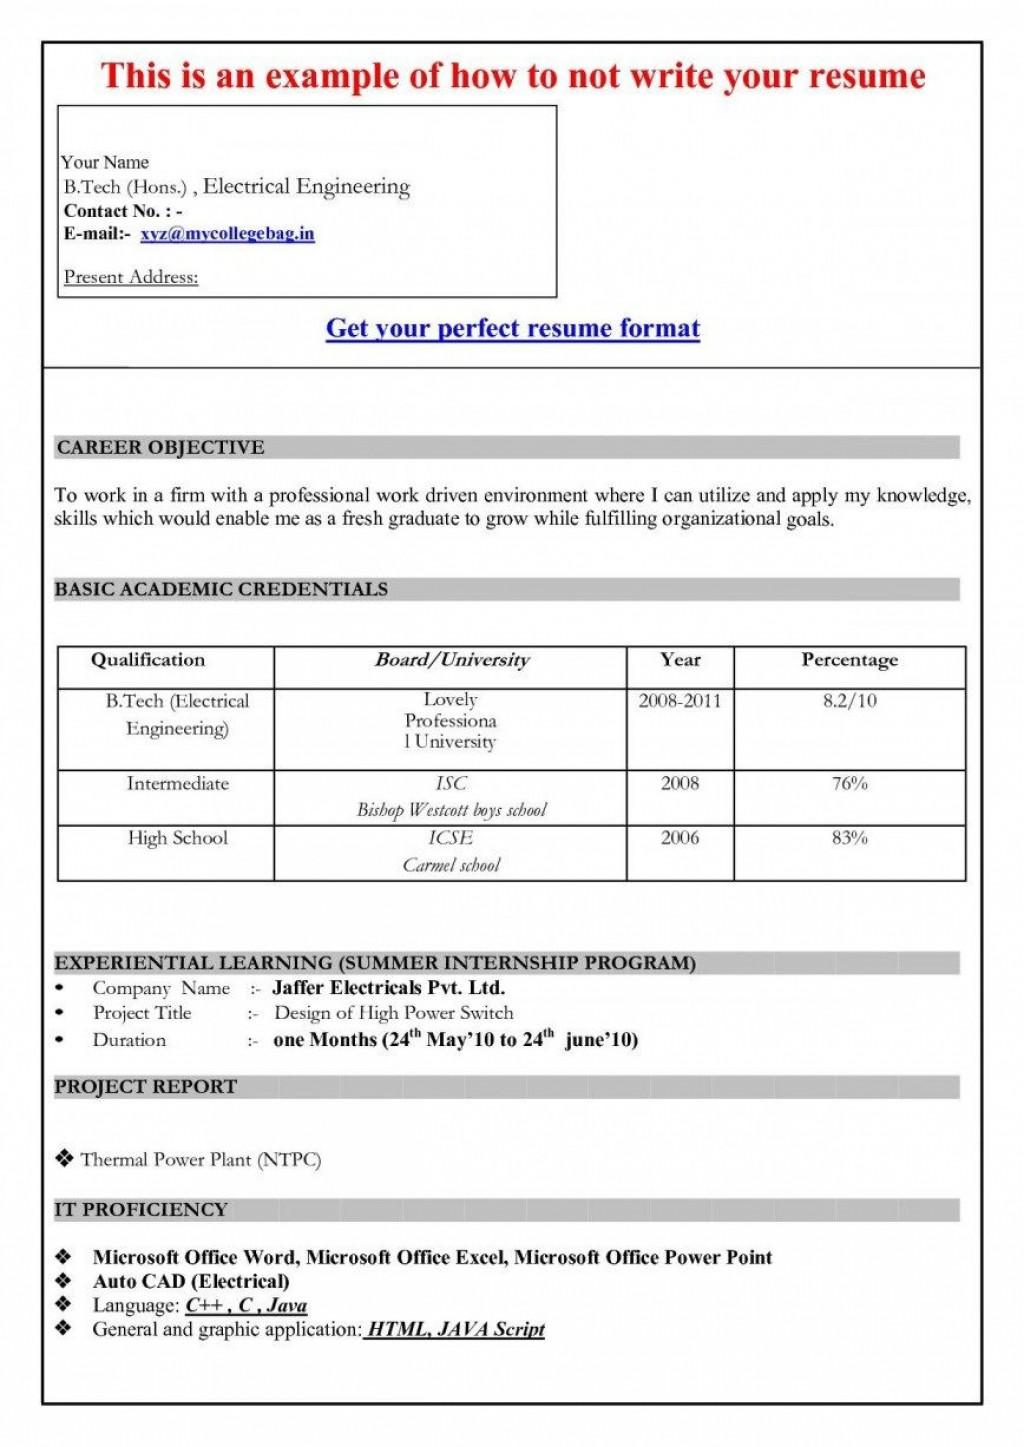 009 Formidable Teacher Resume Template Microsoft Word 2007 Image Large